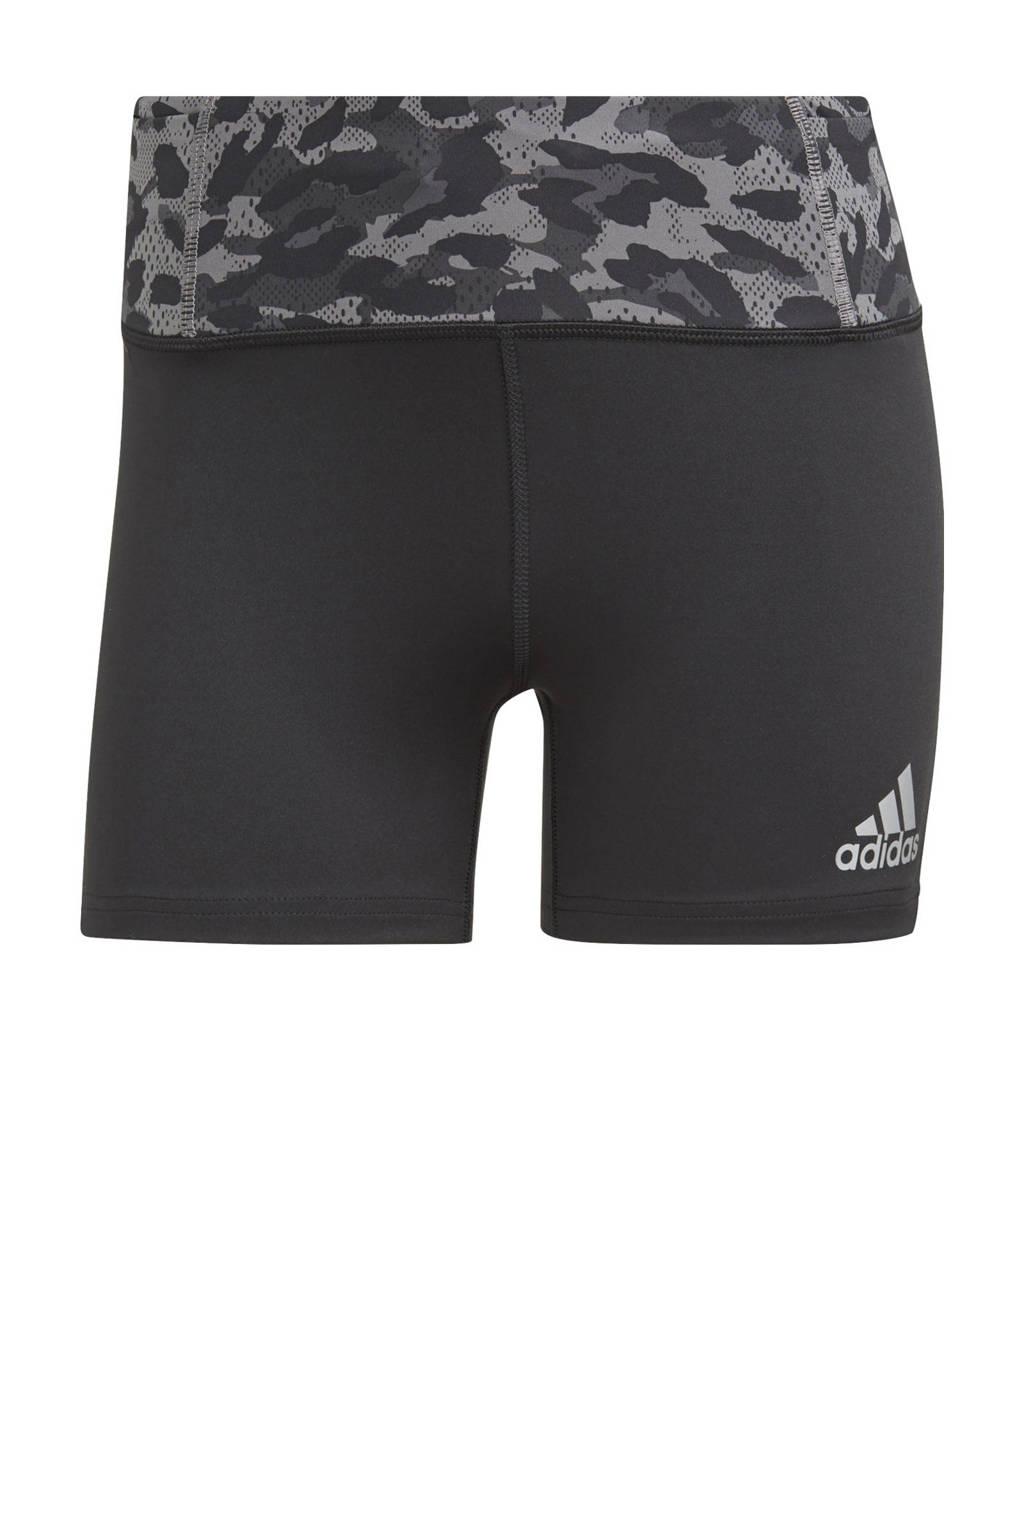 adidas Performance Adizero sportshort zwart/grijs, Zwart/grijs